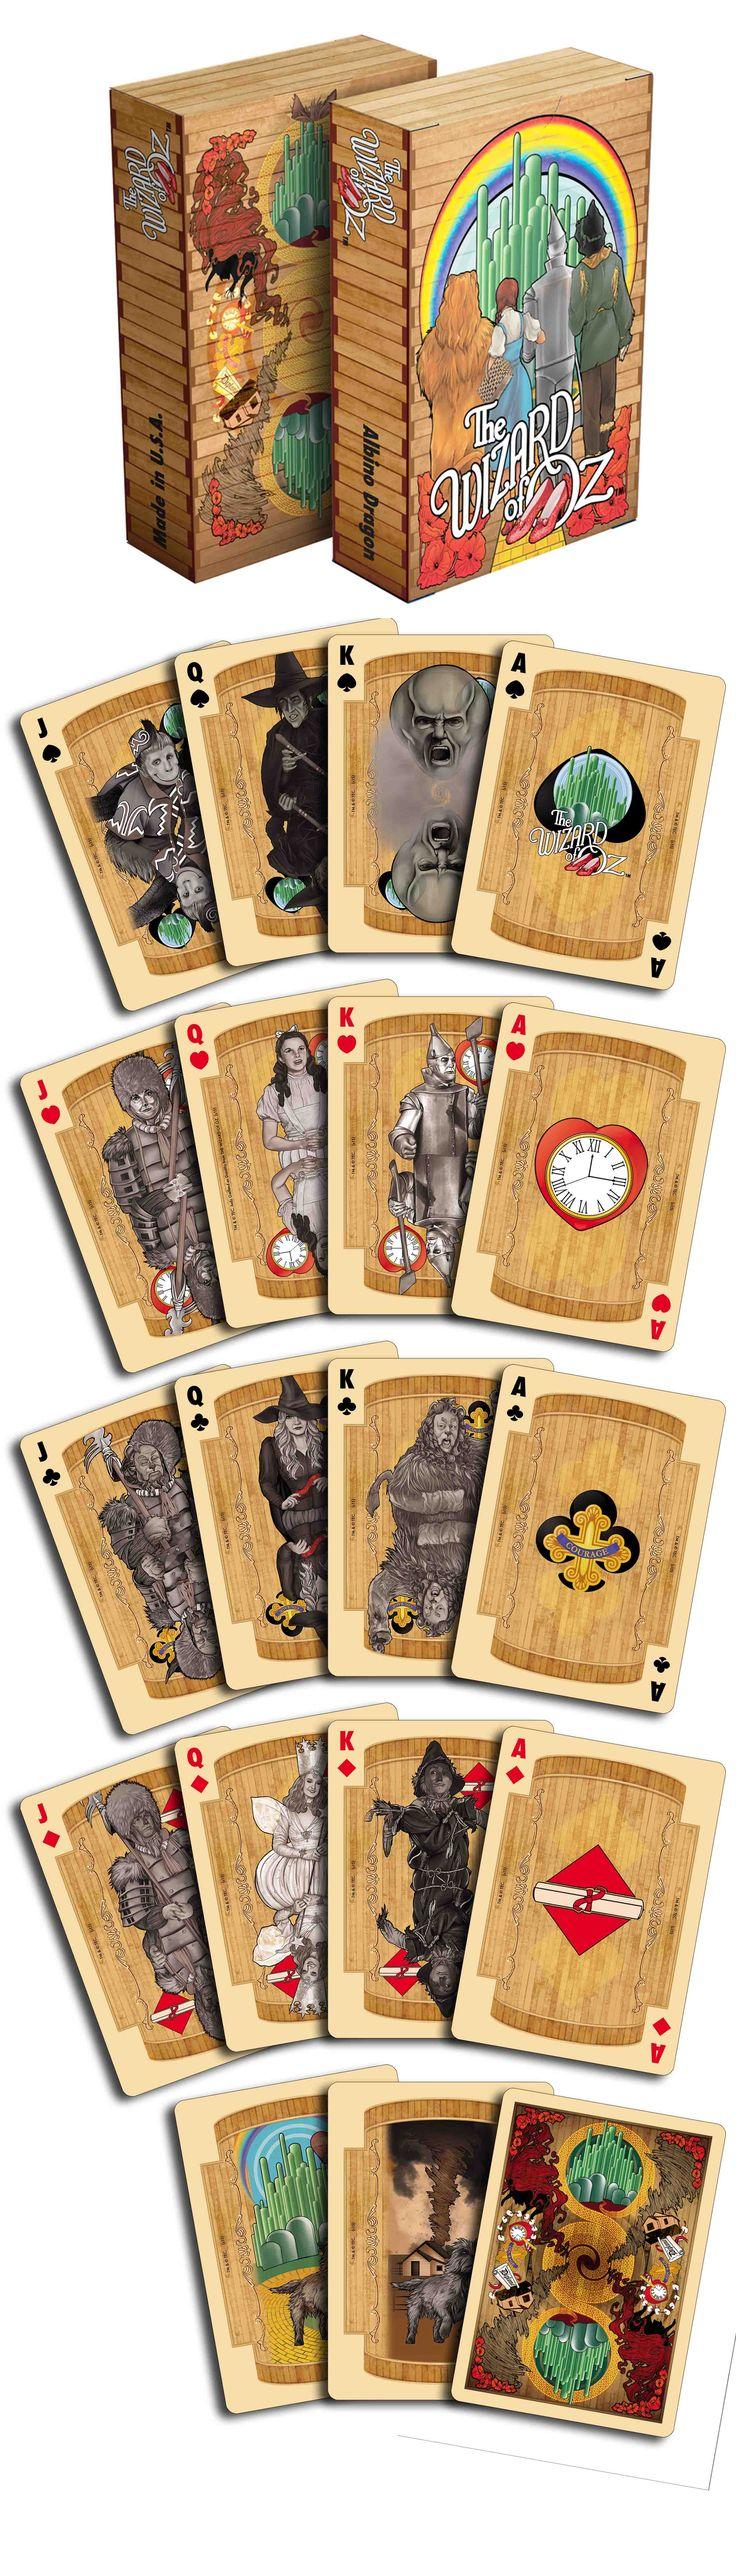 WOZ playing cards!